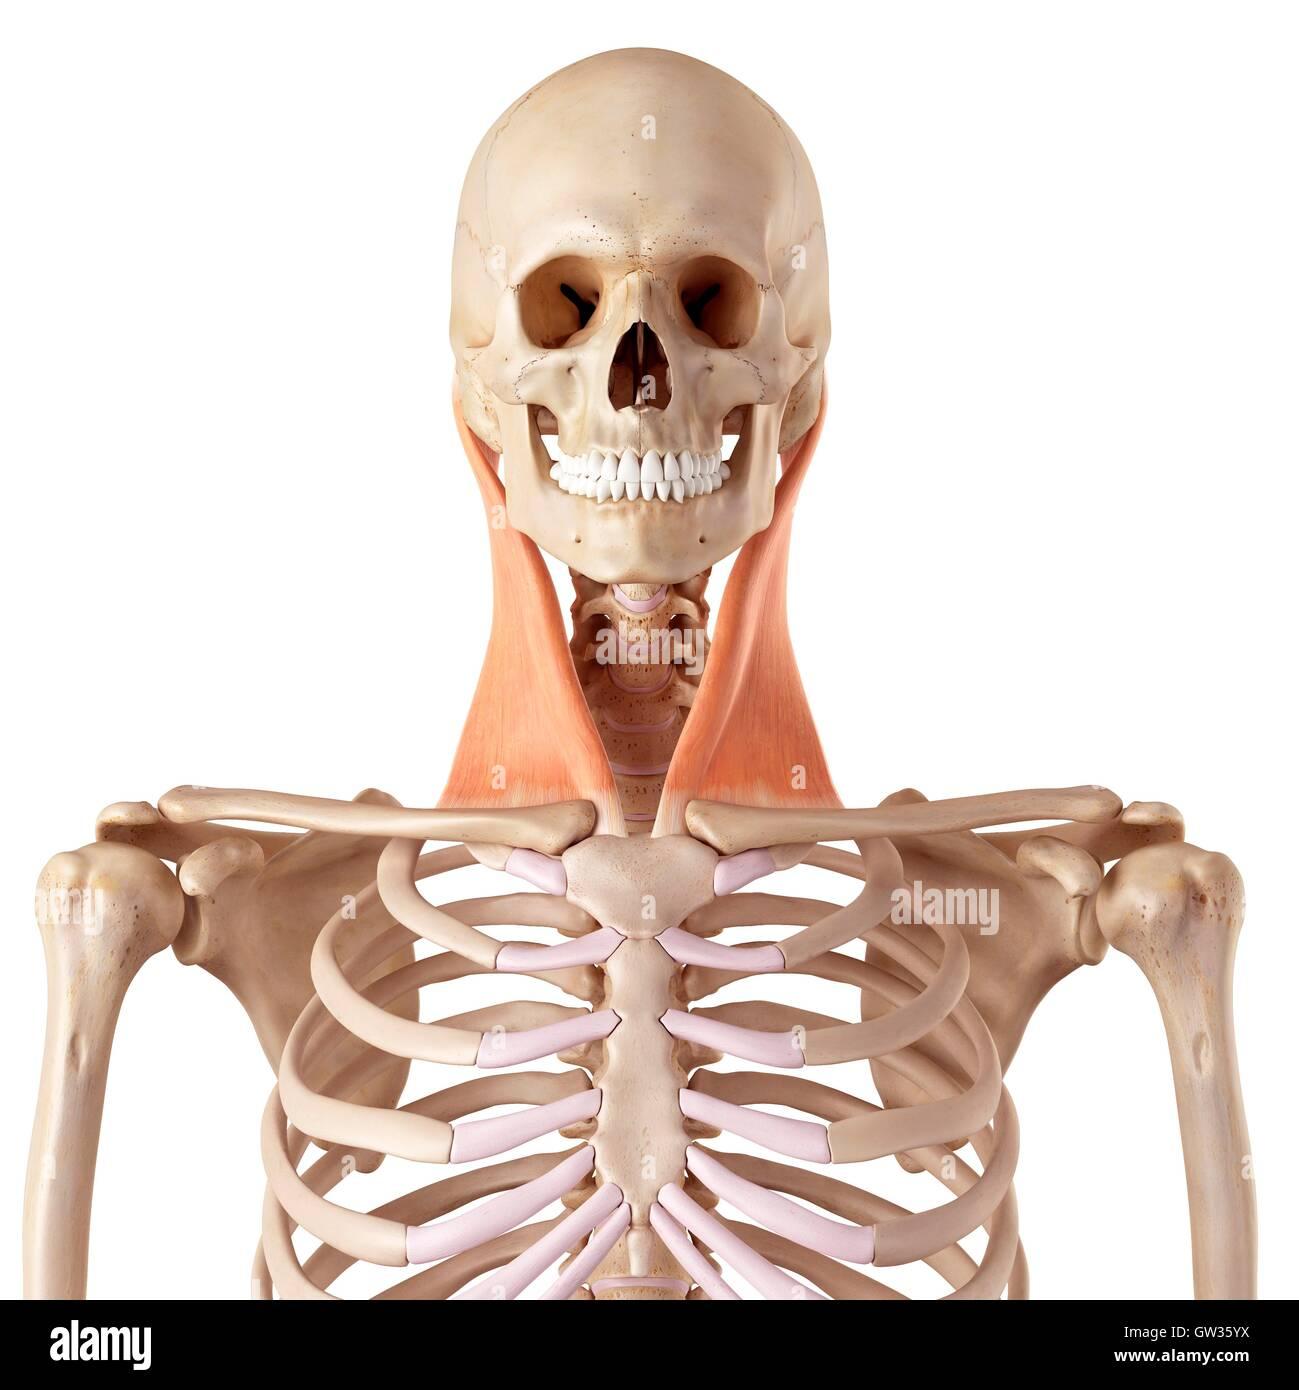 Hals-Muskeln, Abbildung Stockfoto, Bild: 118699166 - Alamy